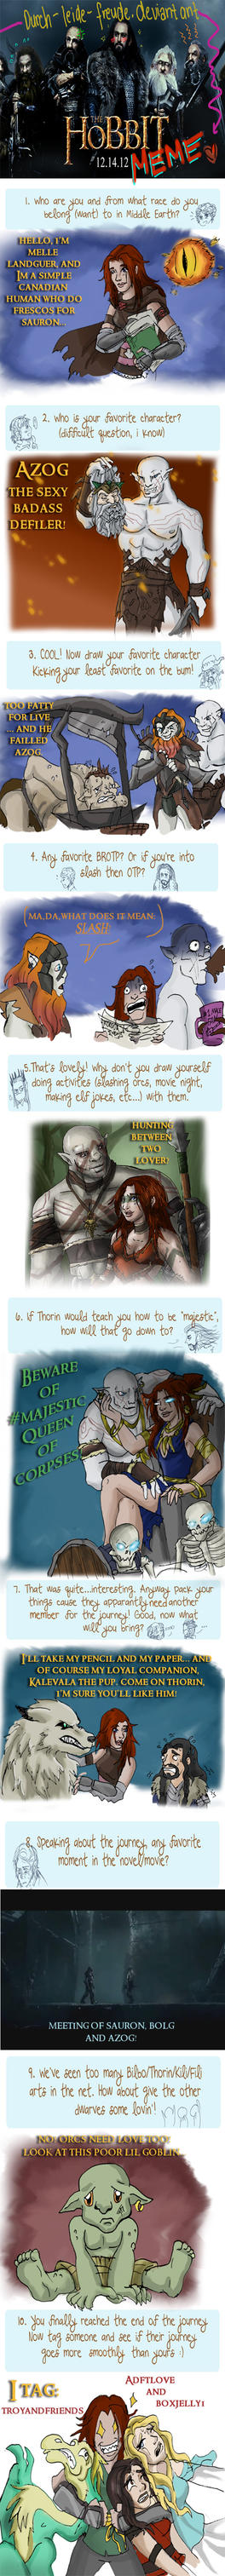 The Hobbit Meme by LaDarkA117